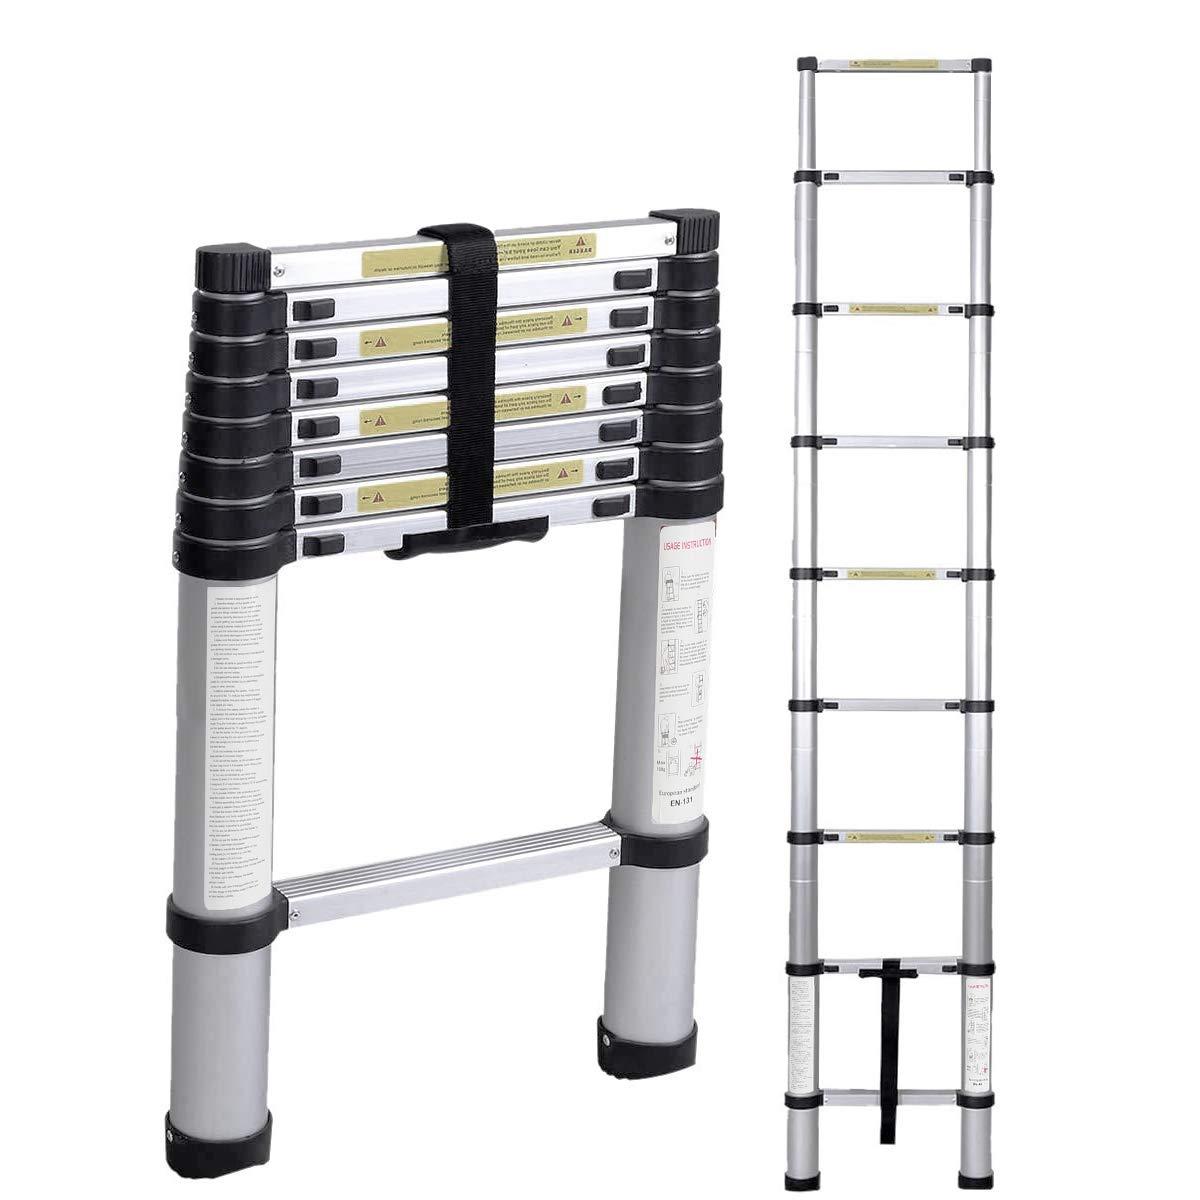 Soges 8.5ft Aluminum Telescopic Extension Ladder,Extendable Telescoping Ladder with Spring Loaded Locking Mechanism Non-Slip Ribbing 330 Pound Capacity EN131 Certified, KS-JF-002